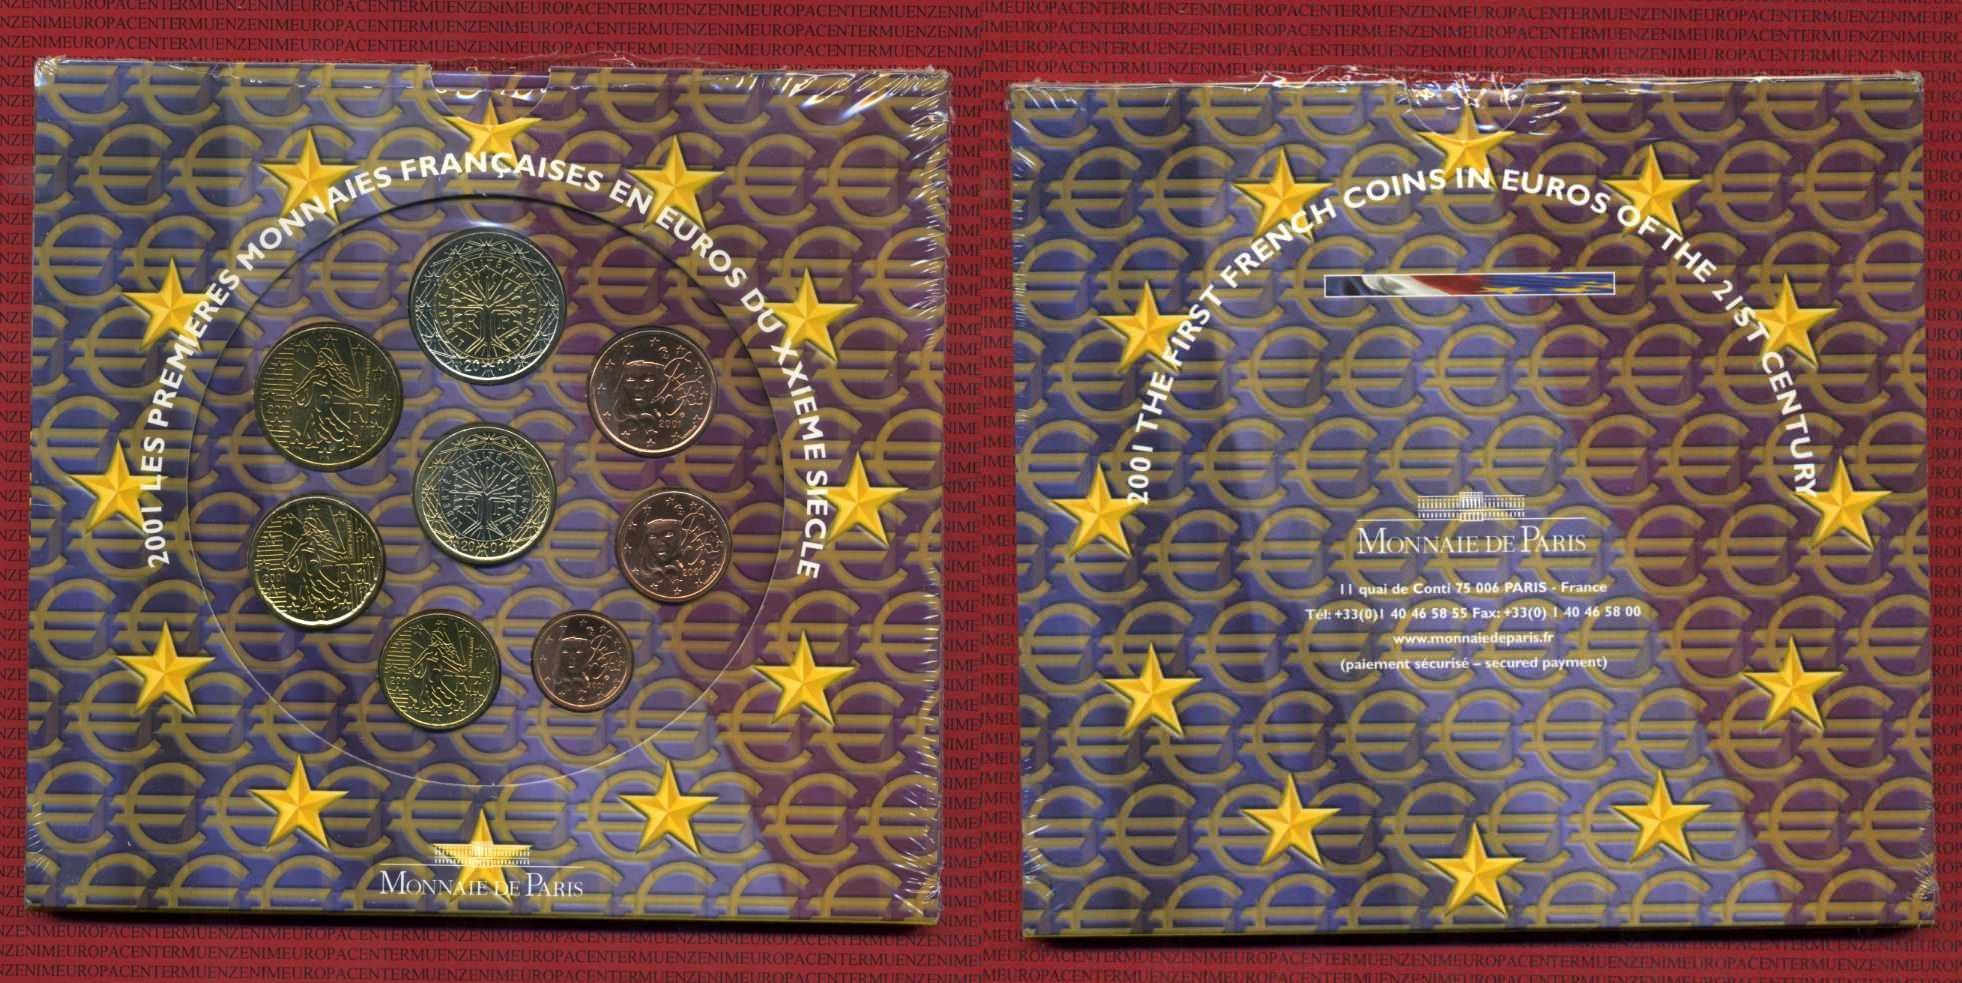 Kursmünzensatz Stgl Kms 2001 Frankreich France Frankreich